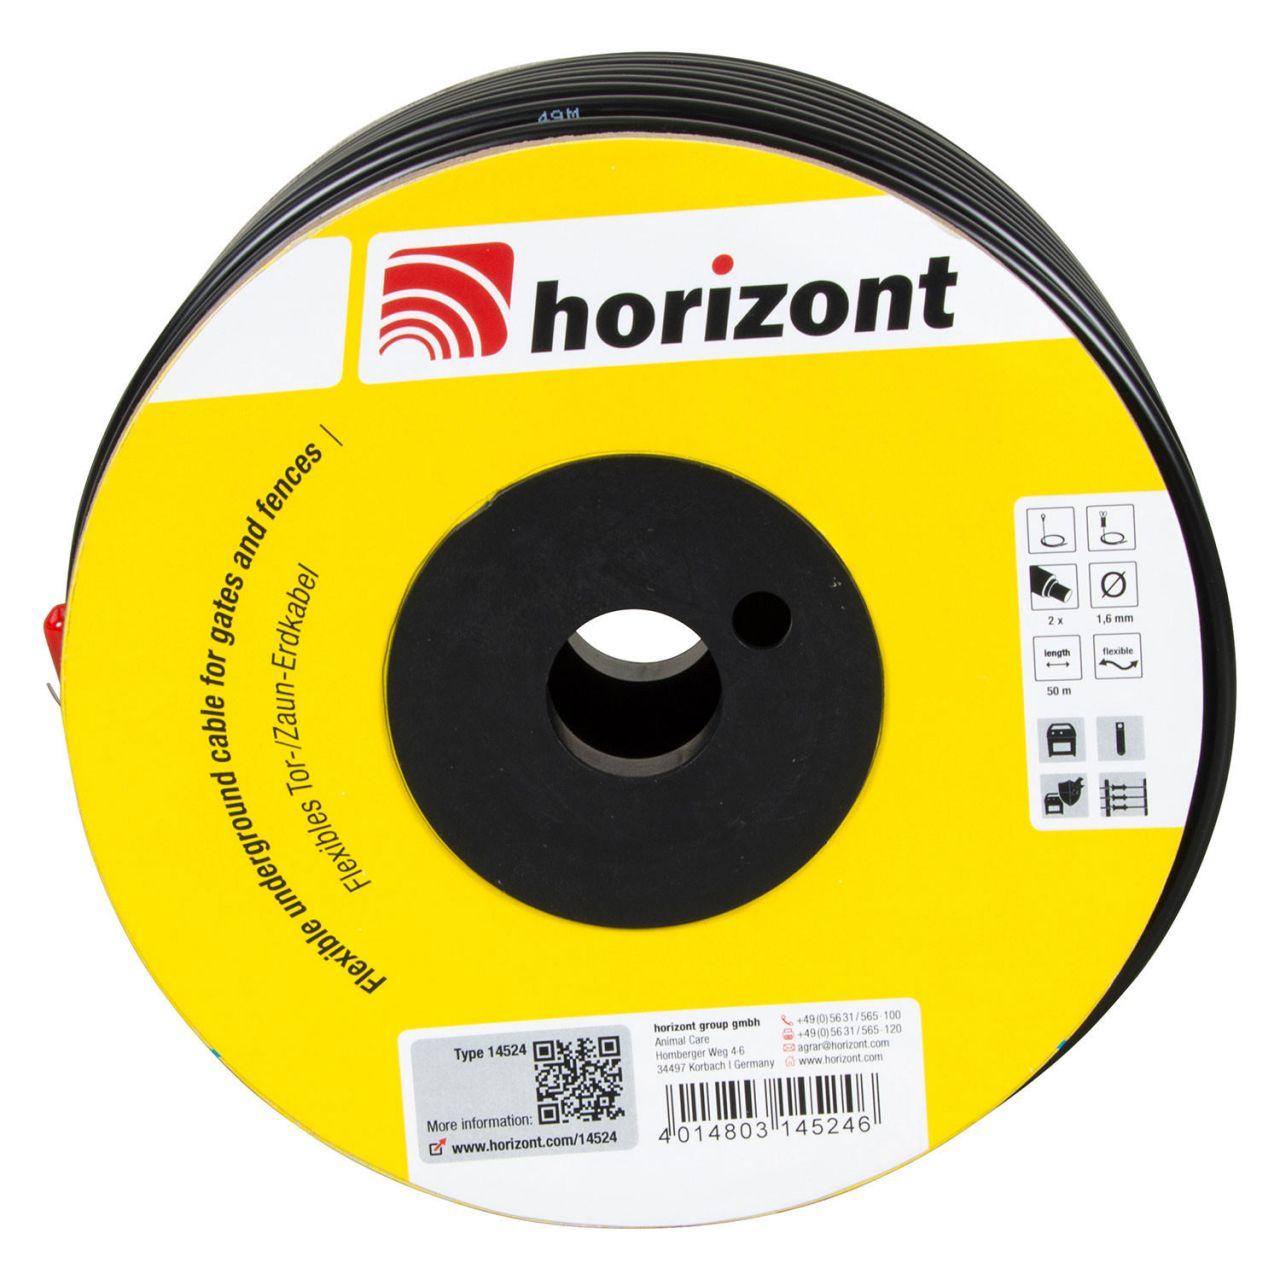 horizont flexibles Tor ZaunErdkabel 50m 14524